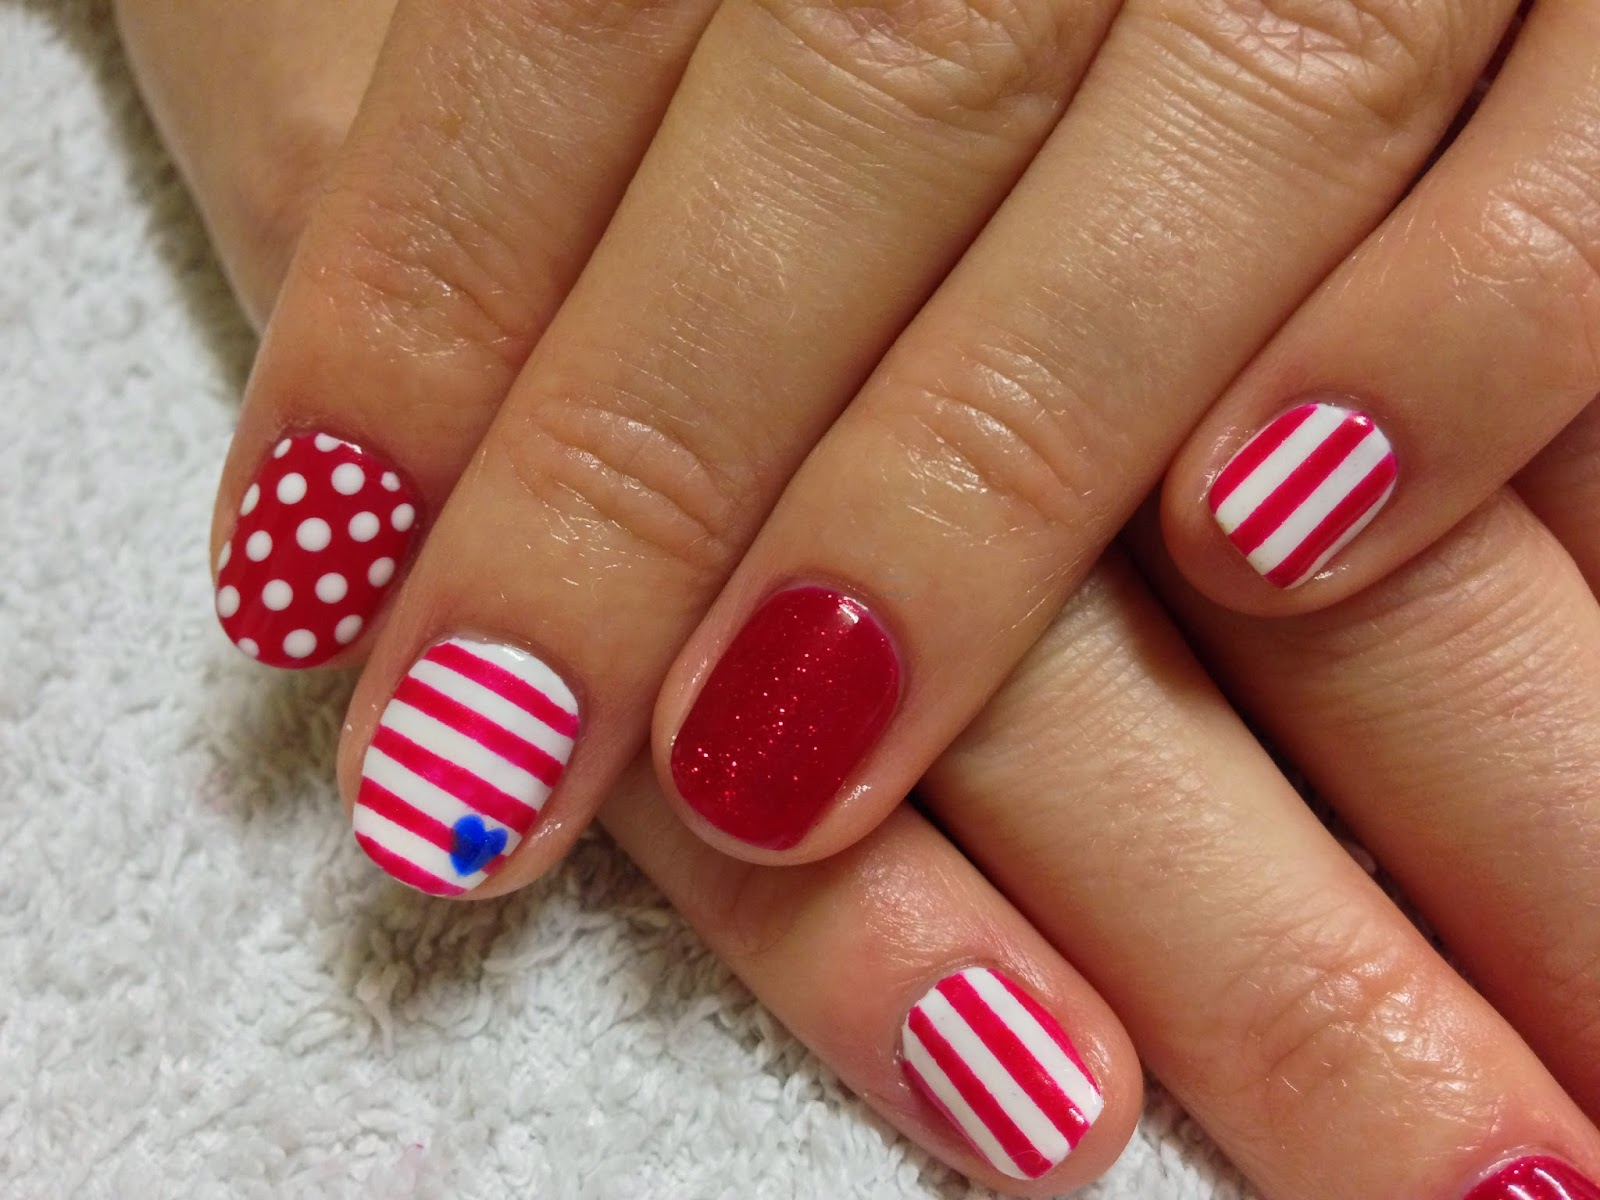 Brush up and polish up cnd shellac nail art nautical nails cnd shellac nail art nautical nails prinsesfo Image collections